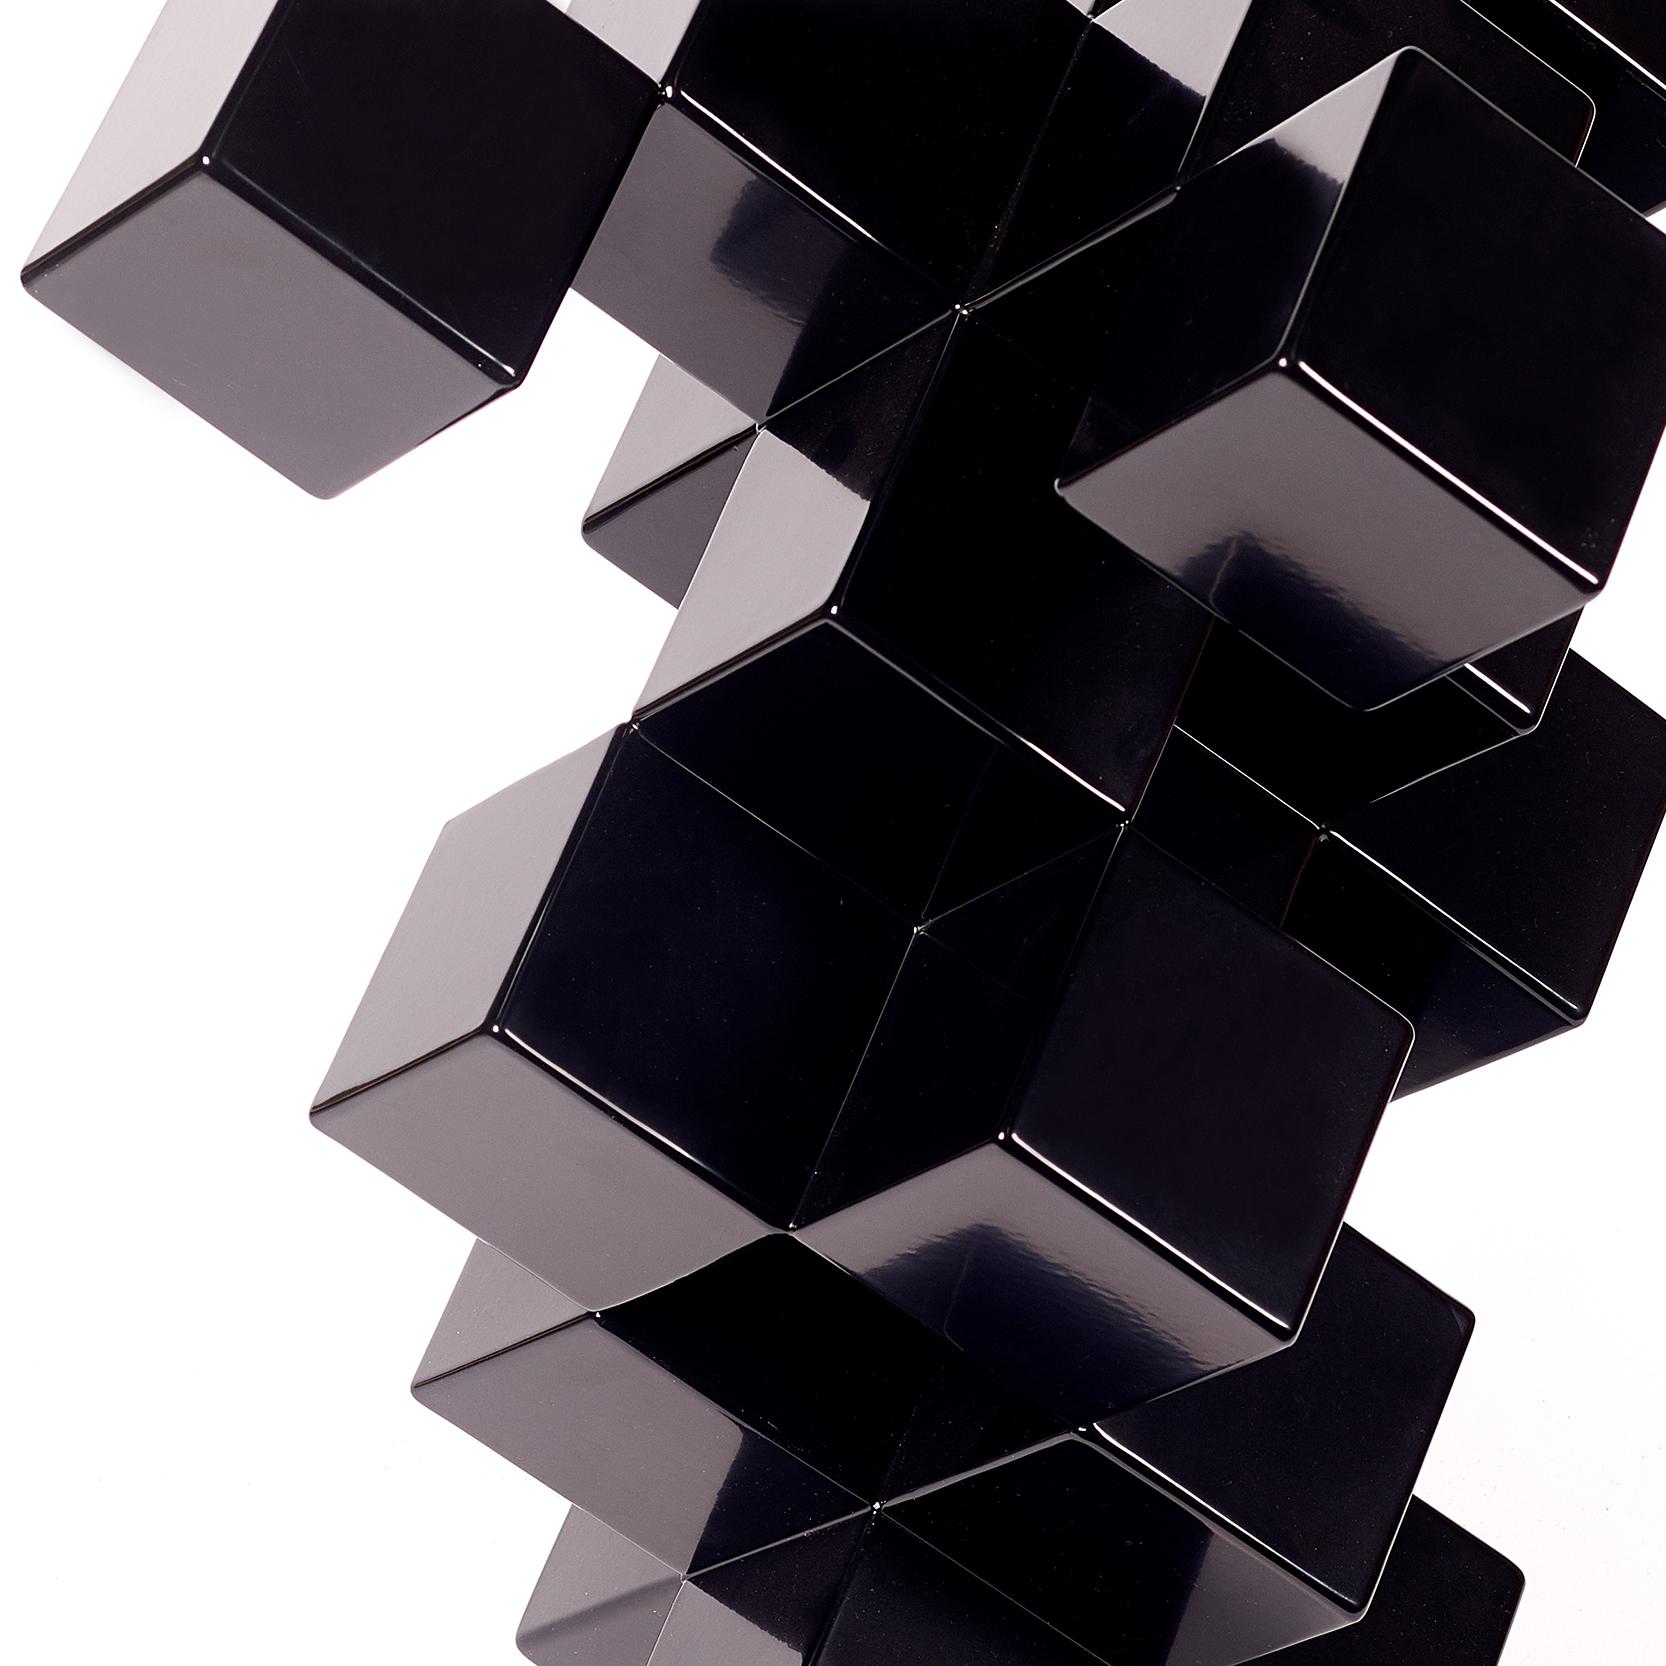 2018_04_08_will_nash_black_cubic_010_int_web_square.jpg